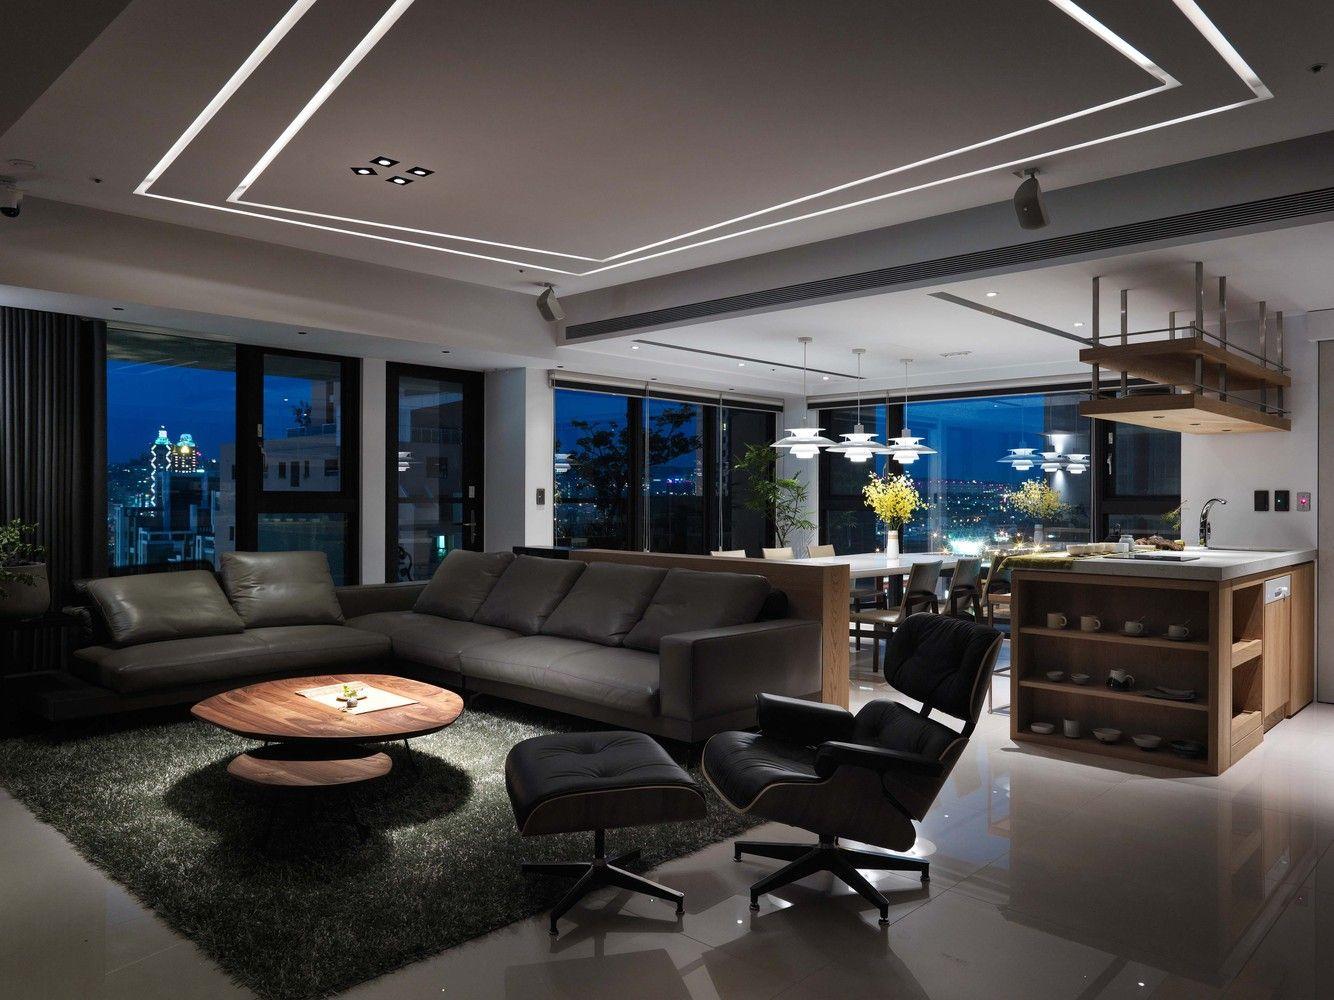 Galeria de Apartamento da Jade / Ryan Lai Architects - 9